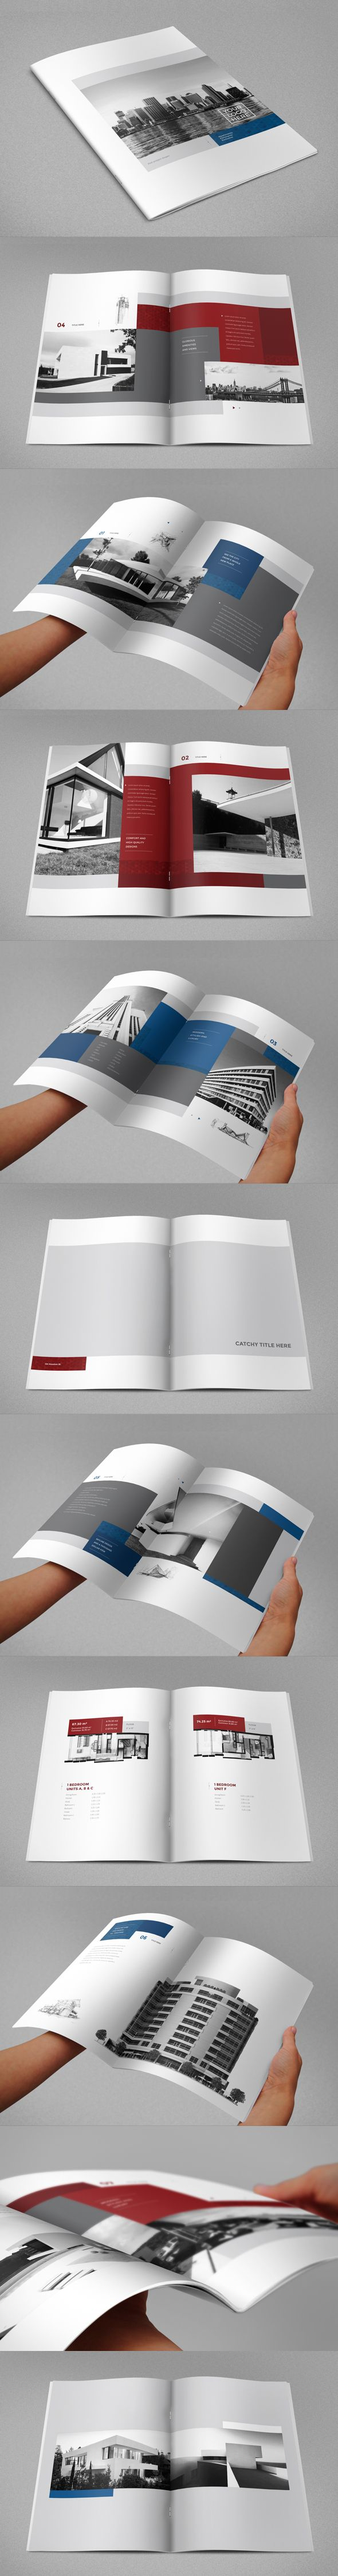 Real Estate Brochure 3 by Abra Design, via Behance